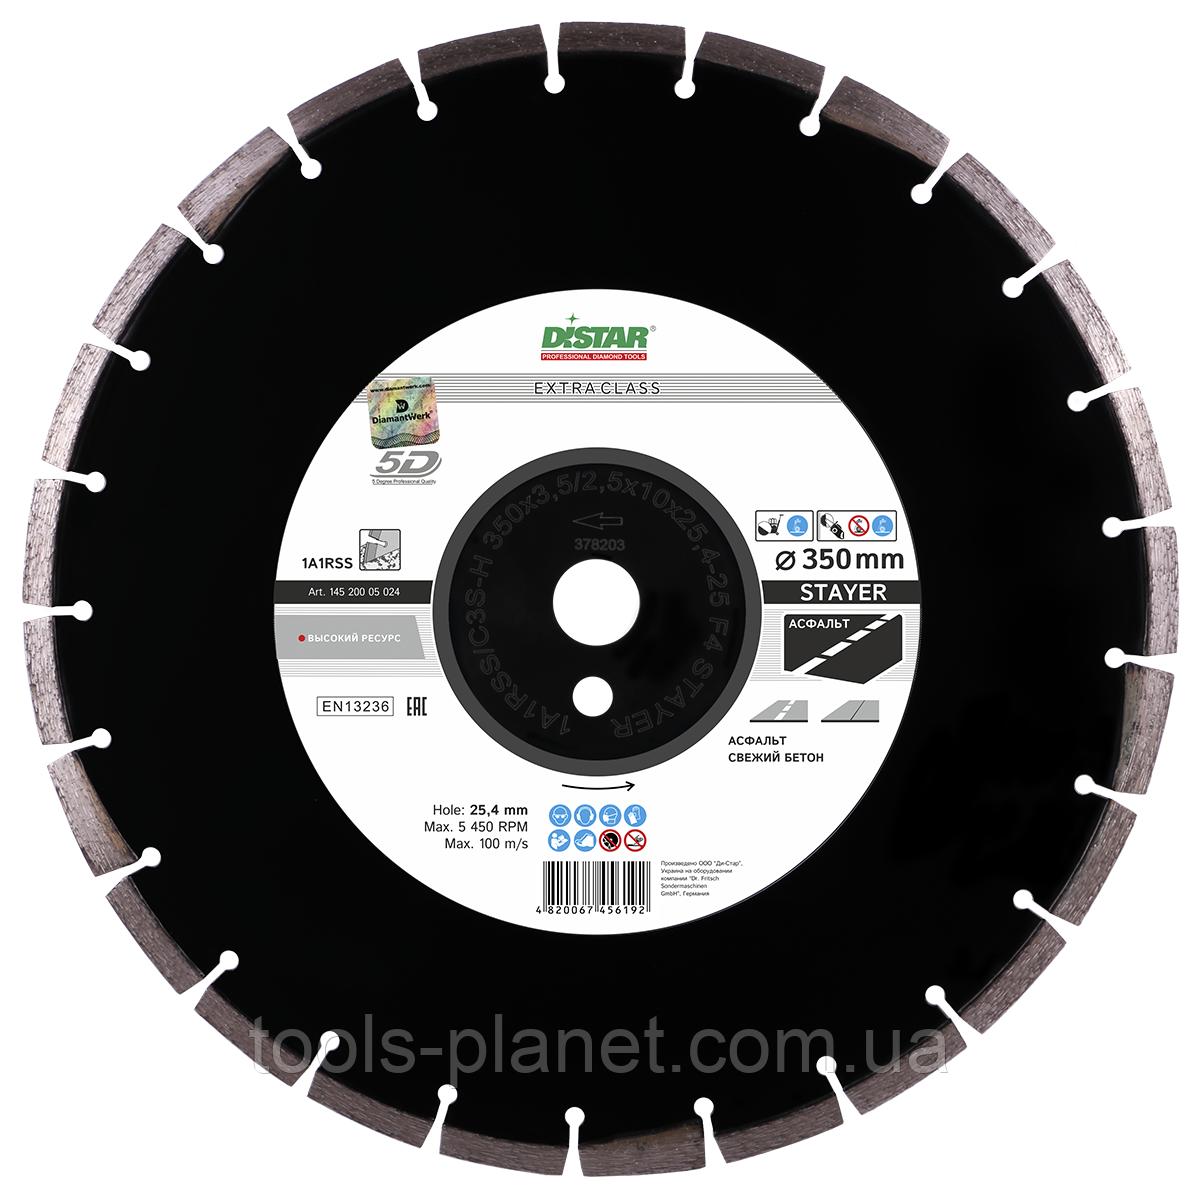 Алмазный диск Distar 1A1RSS/C3S-H 300x3,0/2,0x10x25,4-21 F4 STAYER 5D (14520005022)